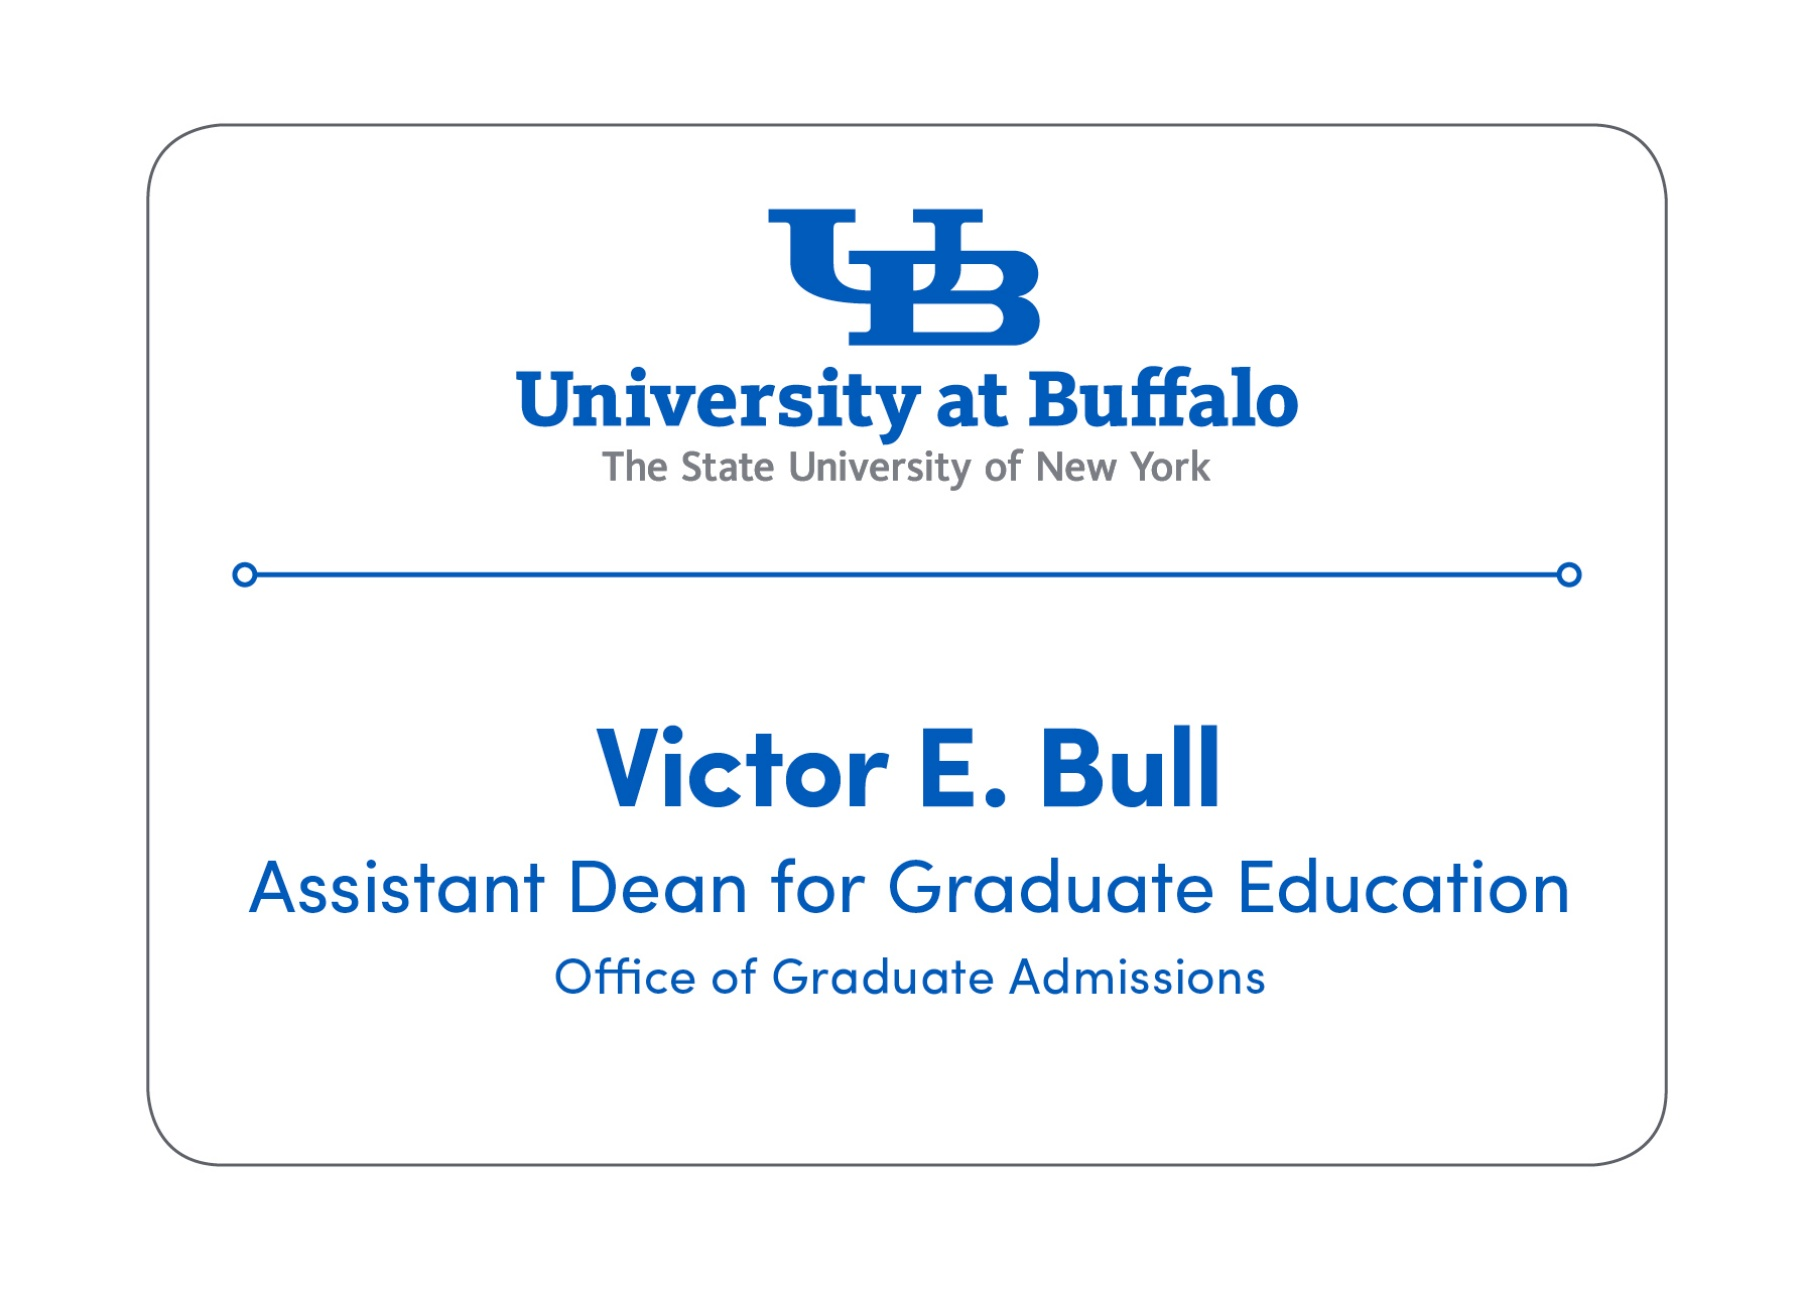 Name Tags Identity And Brand University At Buffalo